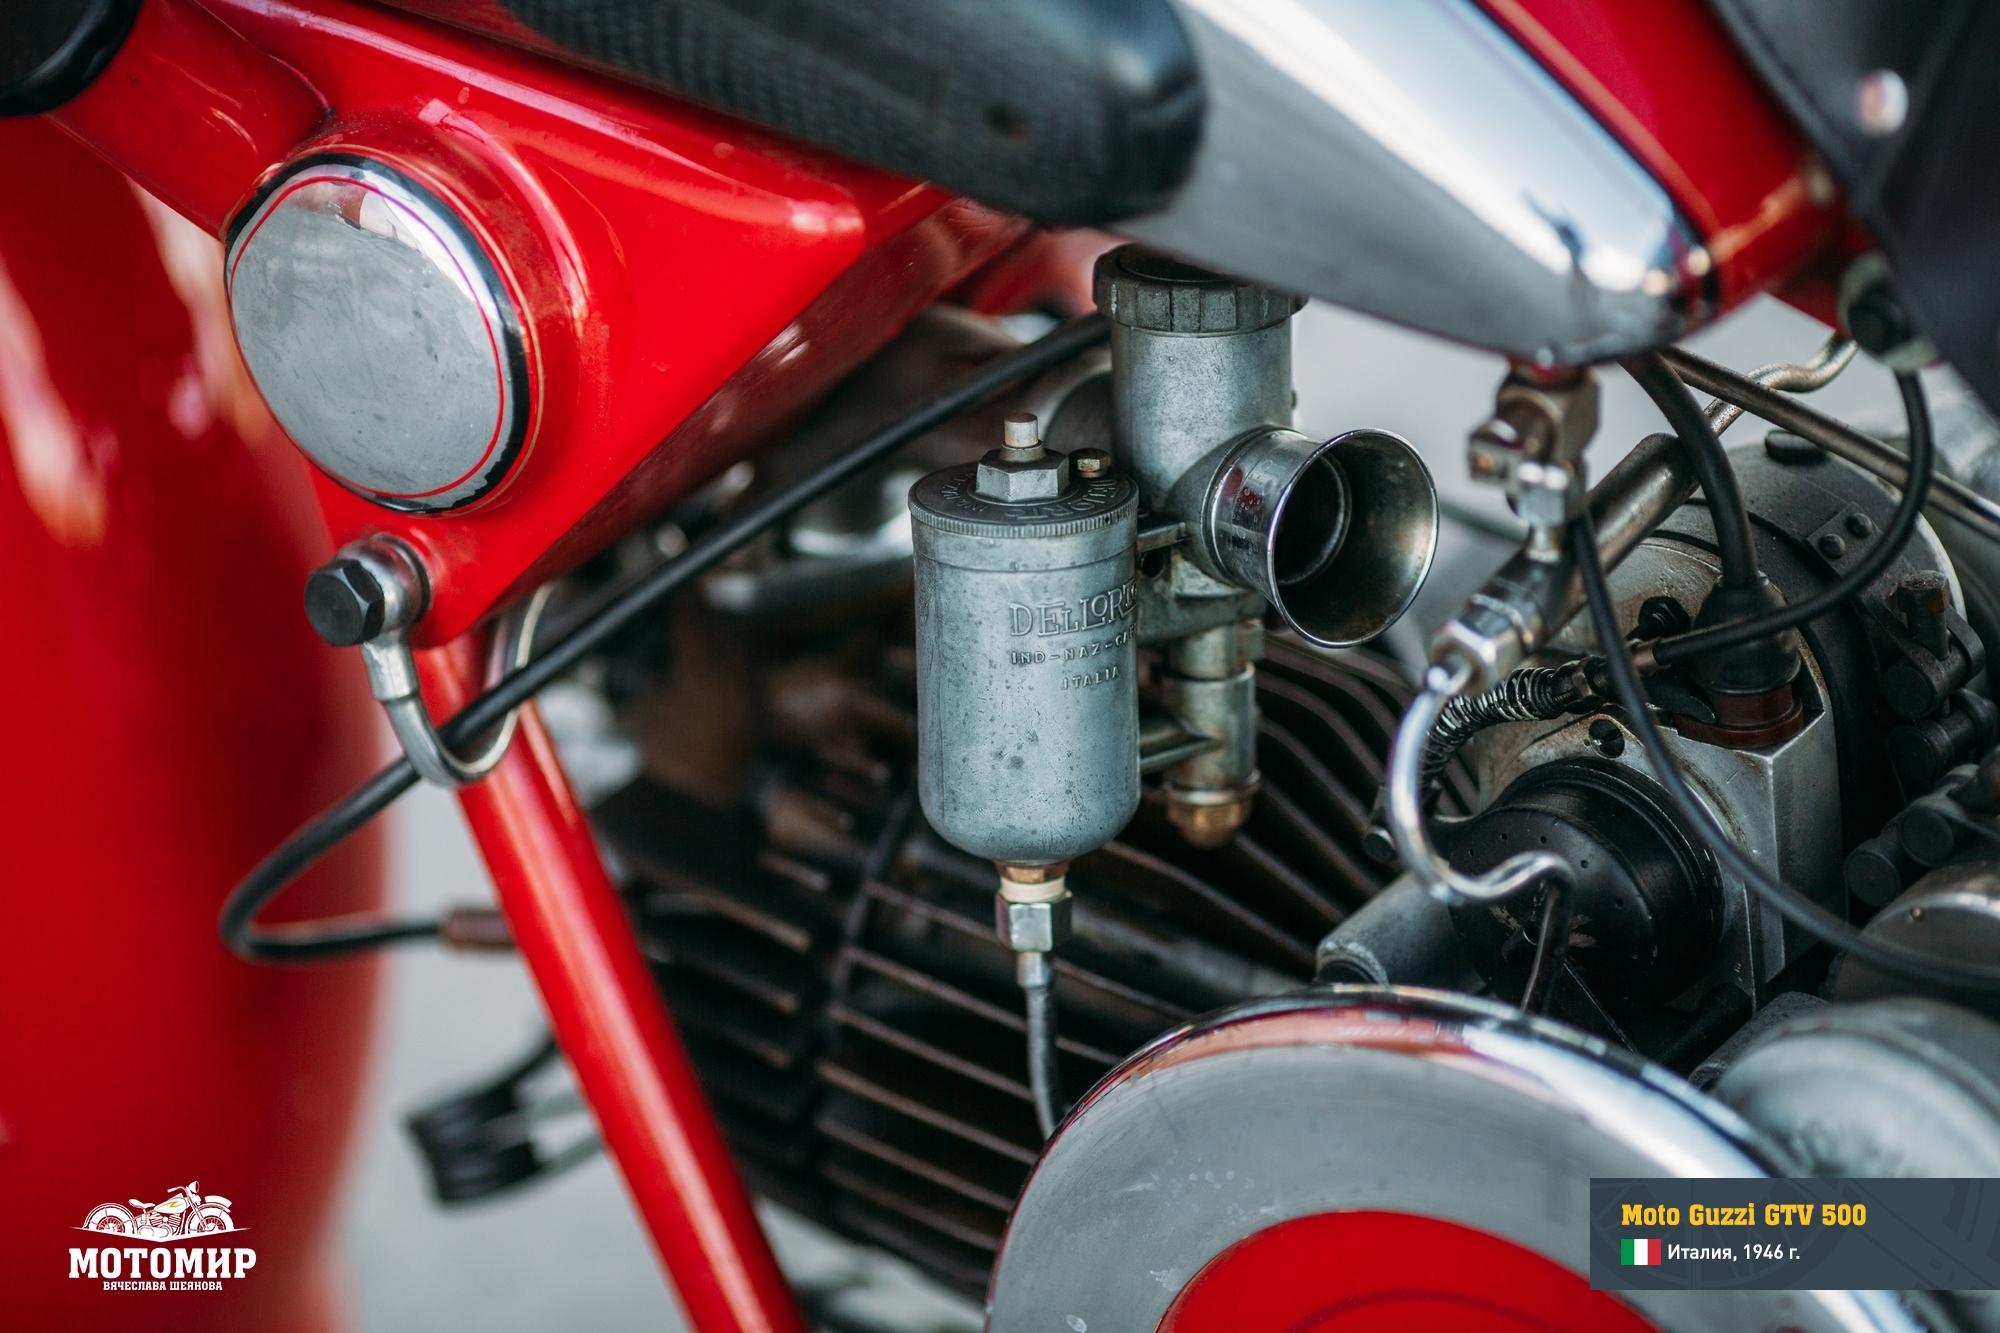 moto-guzzi-gtv-500-201509-web-15